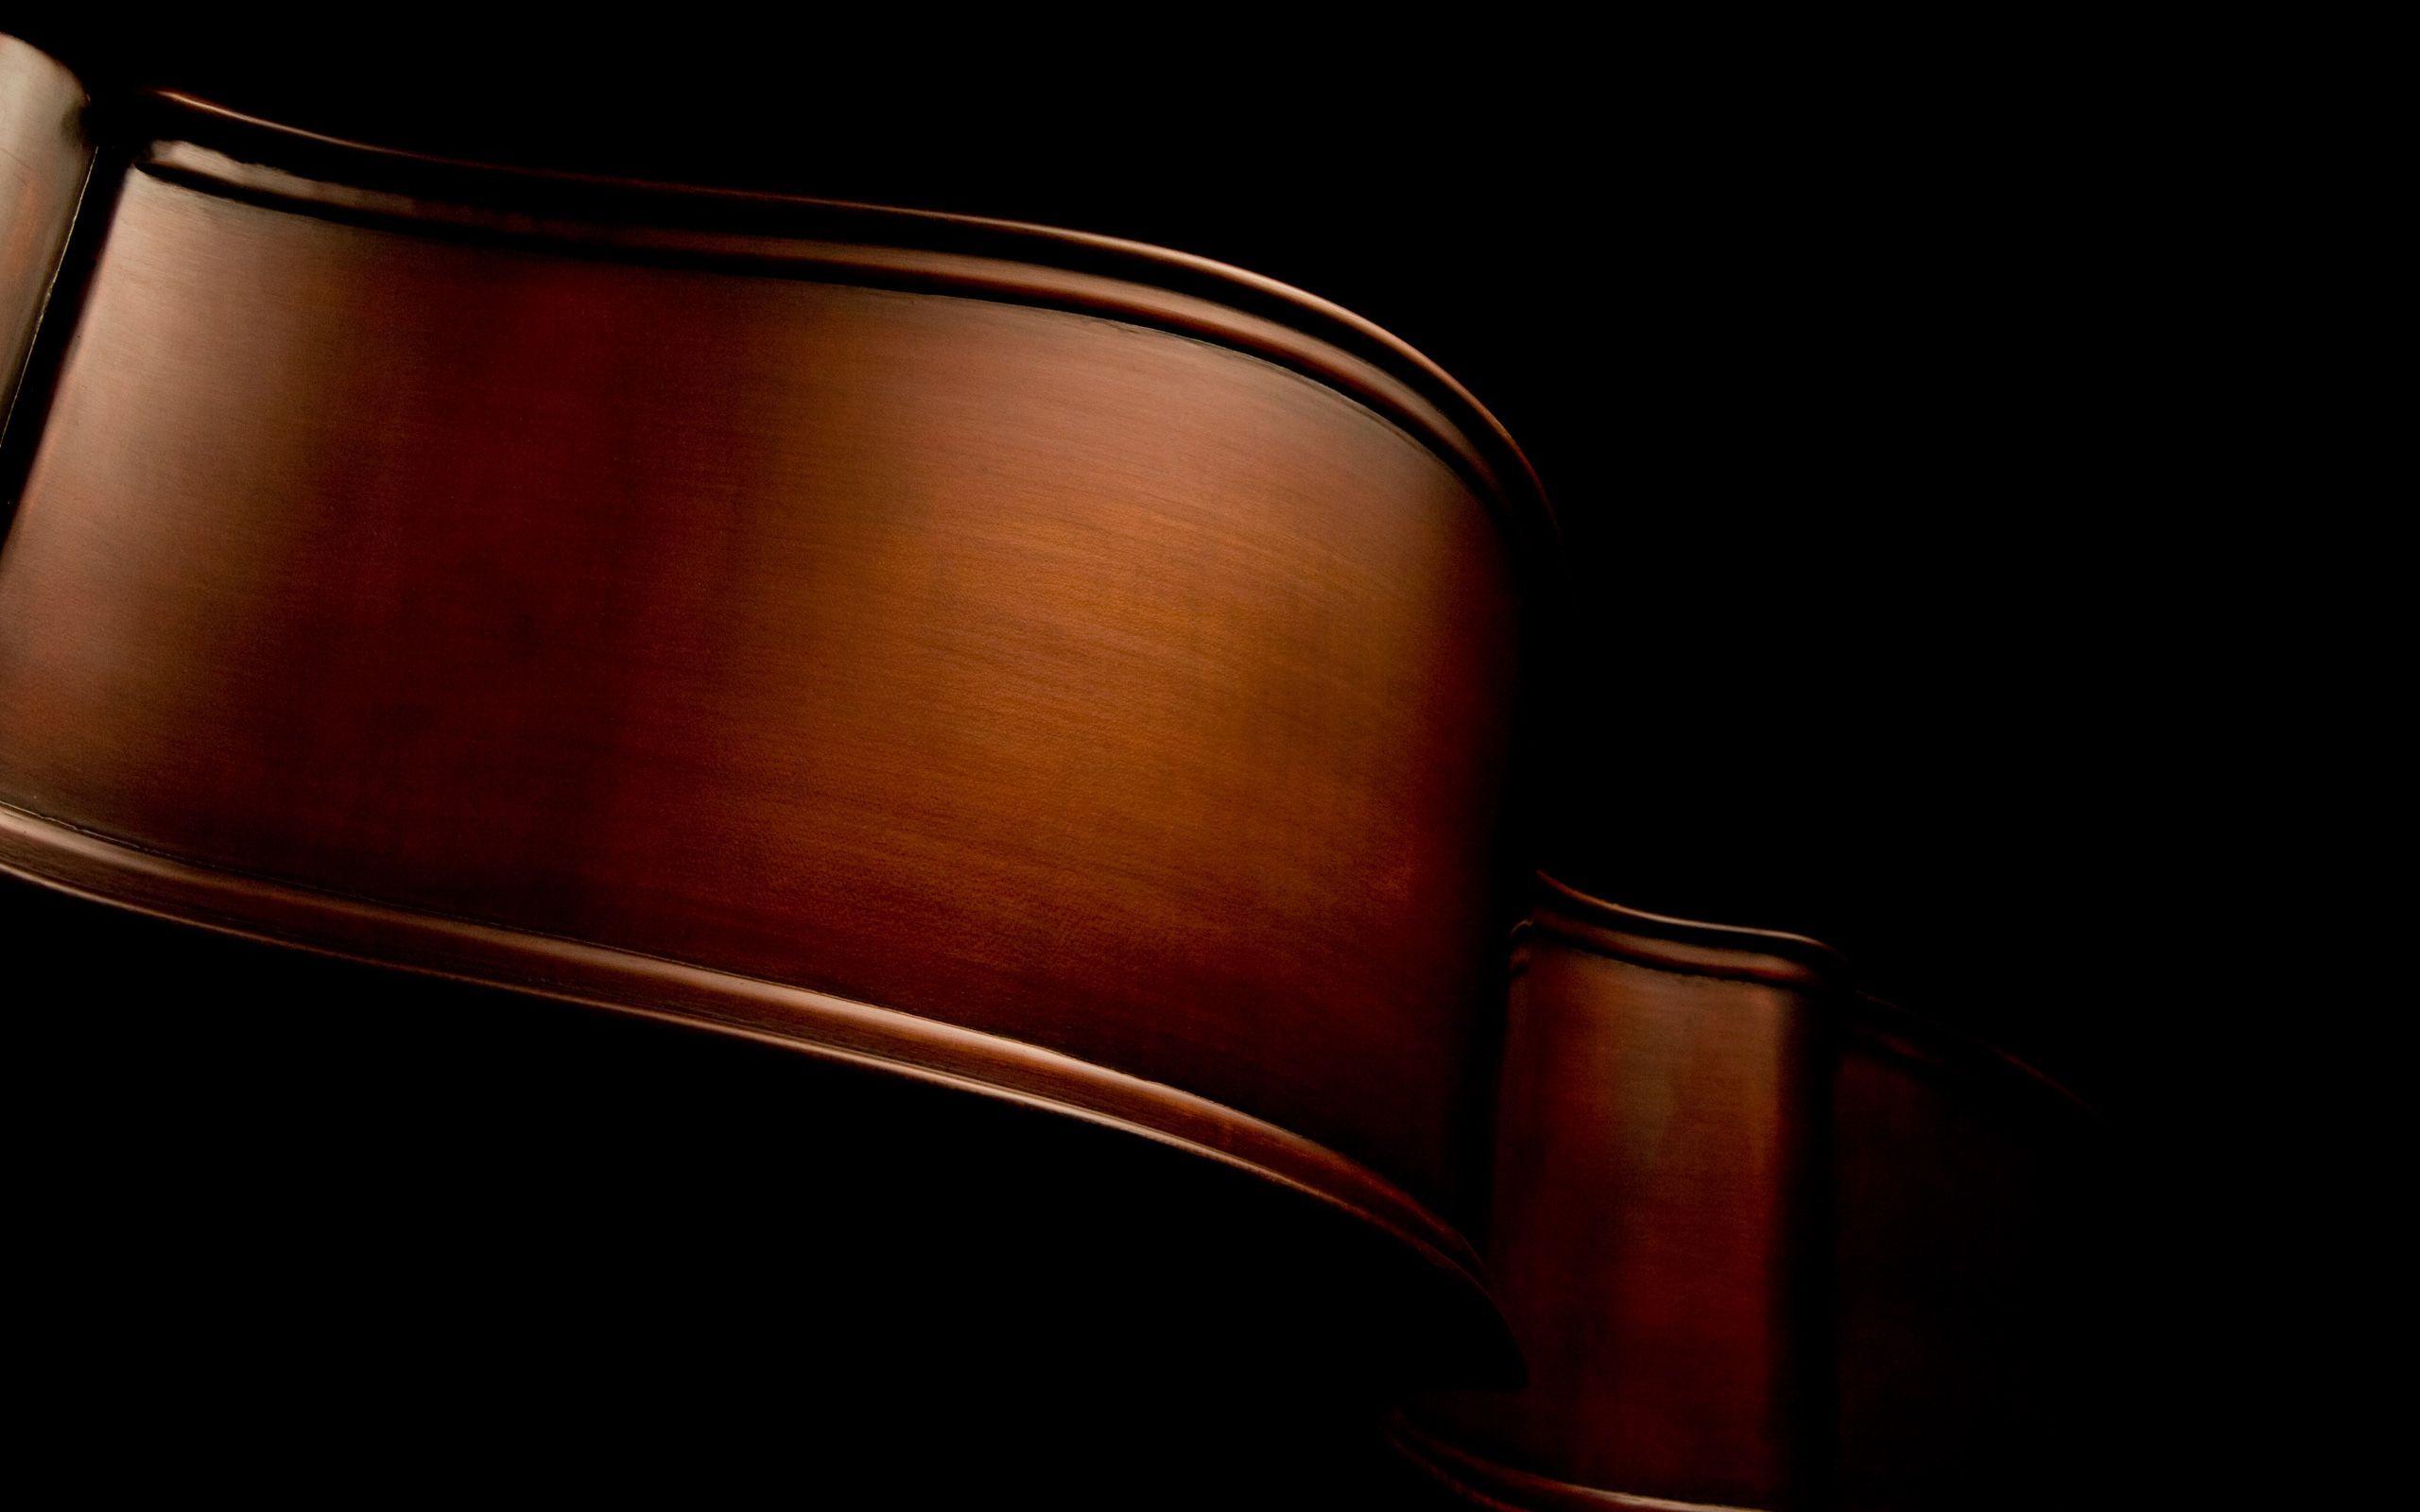 Cello Wallpaper Photo 22287 Hd Pictures: Cello Wallpaper Free 43592 HD Pictures